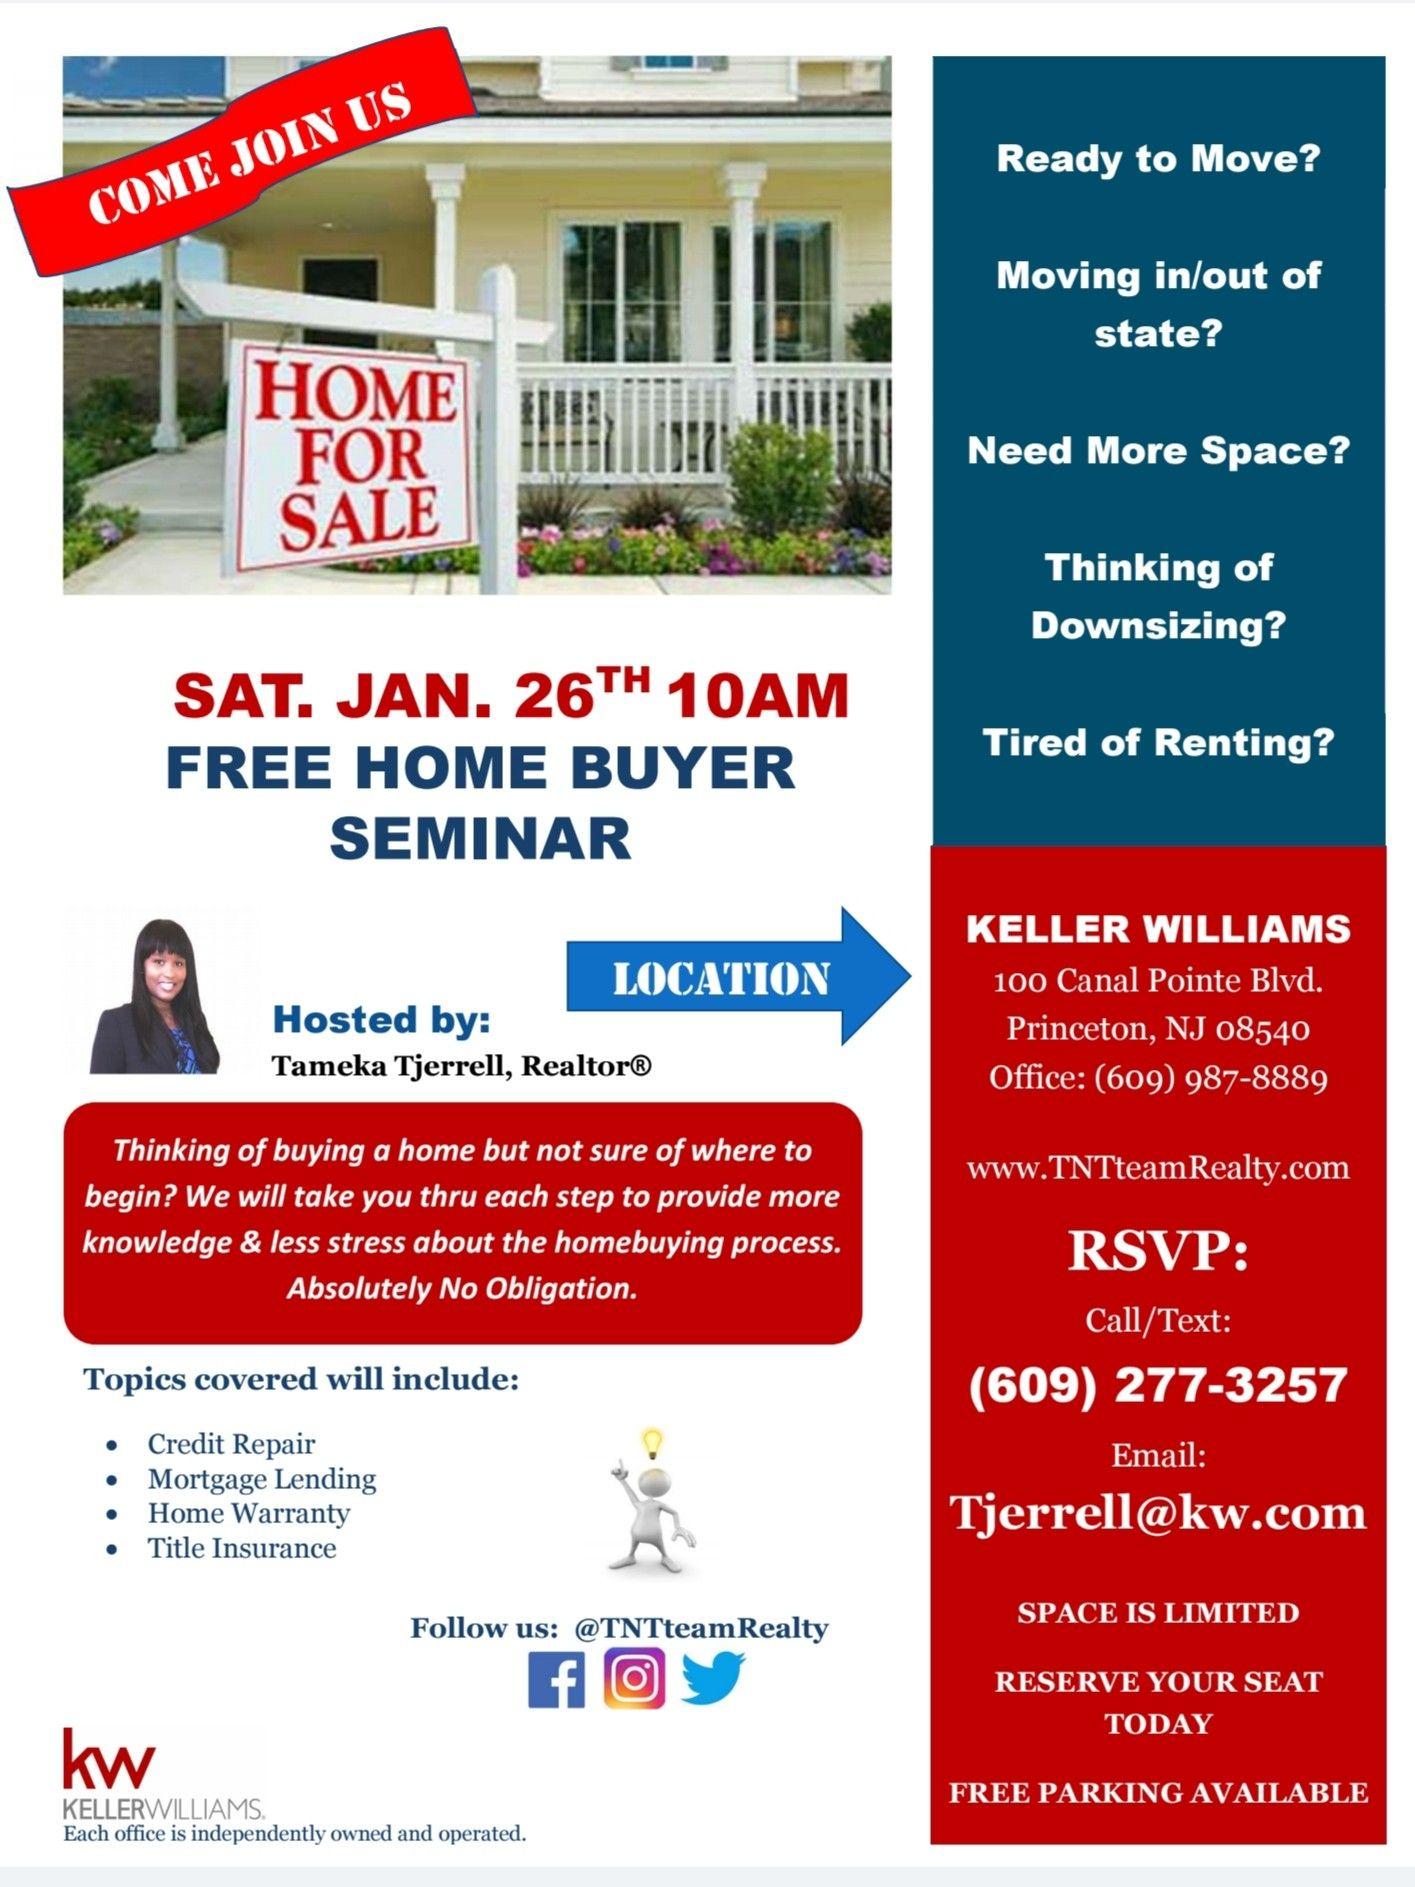 Free Homebuyer Seminar Home Buying First Time Home Buyers Seminar Home buyer seminar flyer template